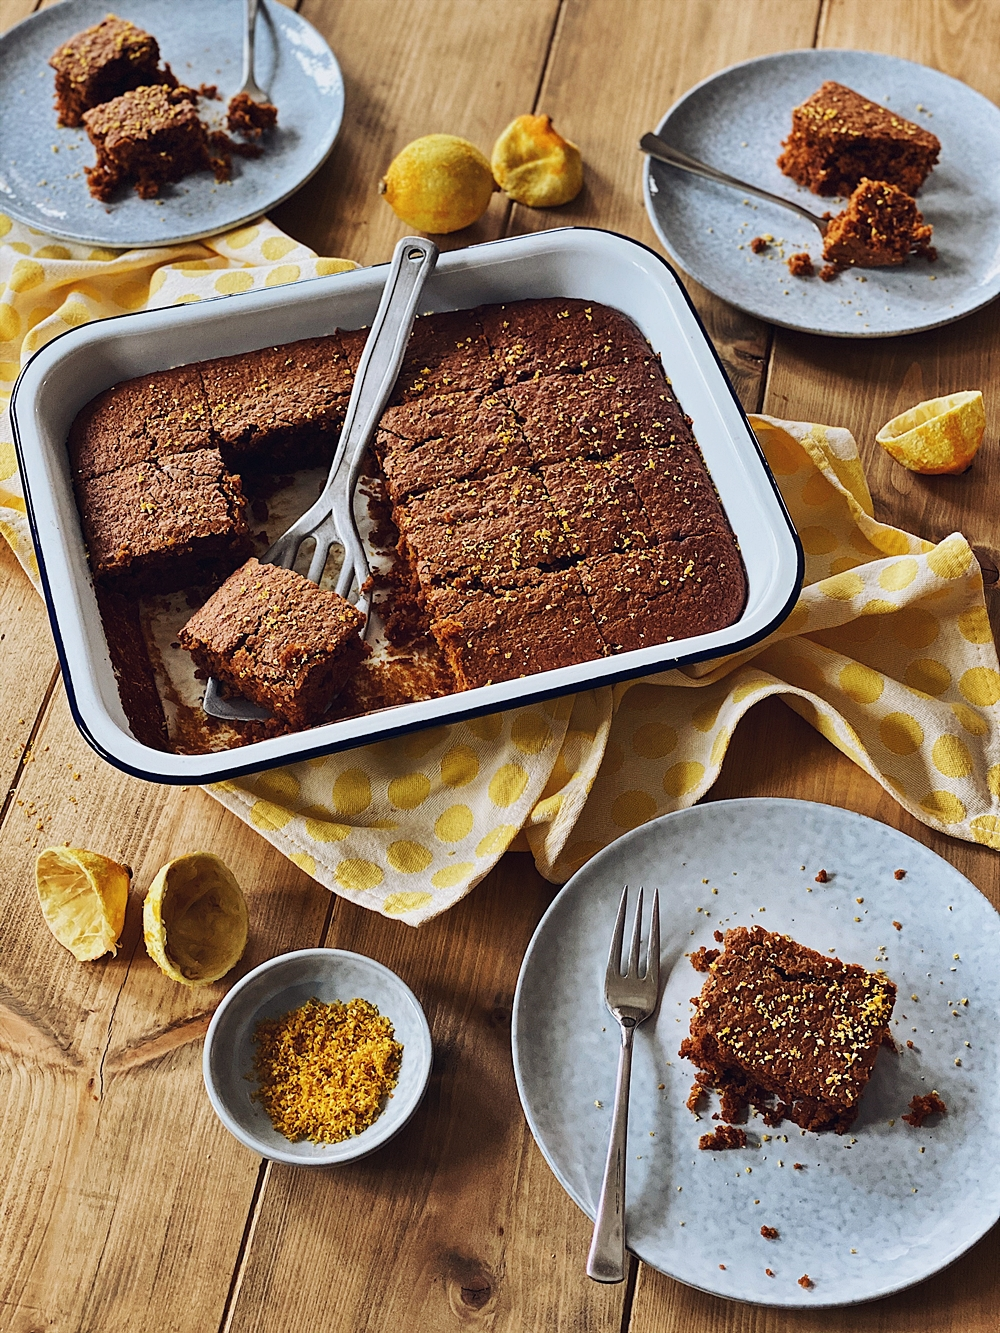 Schoko-Kürbis Brownies mit Kokos und Zitrone